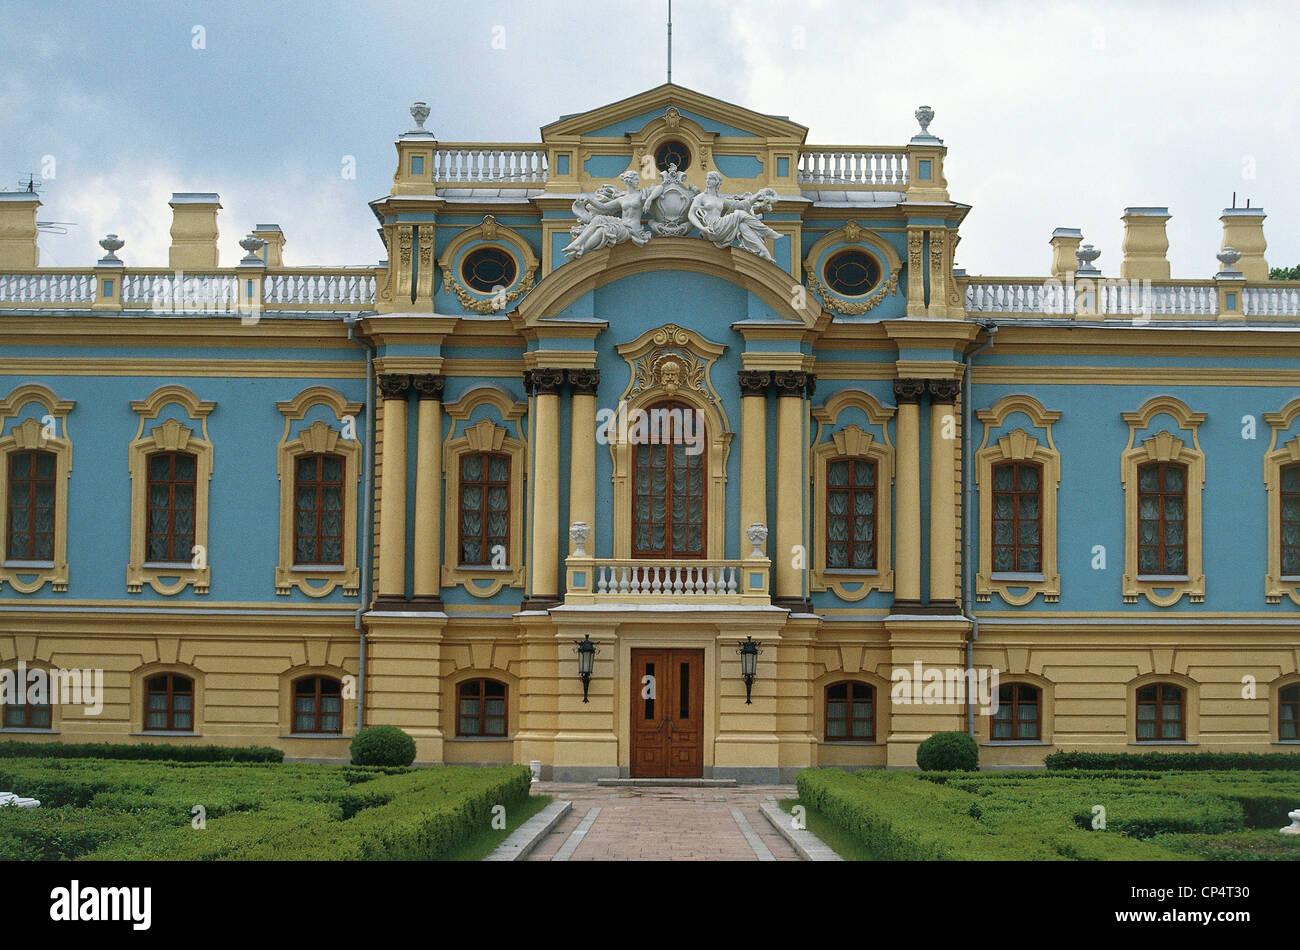 Ukraine - Kyiv (Kiev) - the Mariinsky Palace (1750-1755, architect Francesco Bartolomeo Rastrelli). - Stock Image